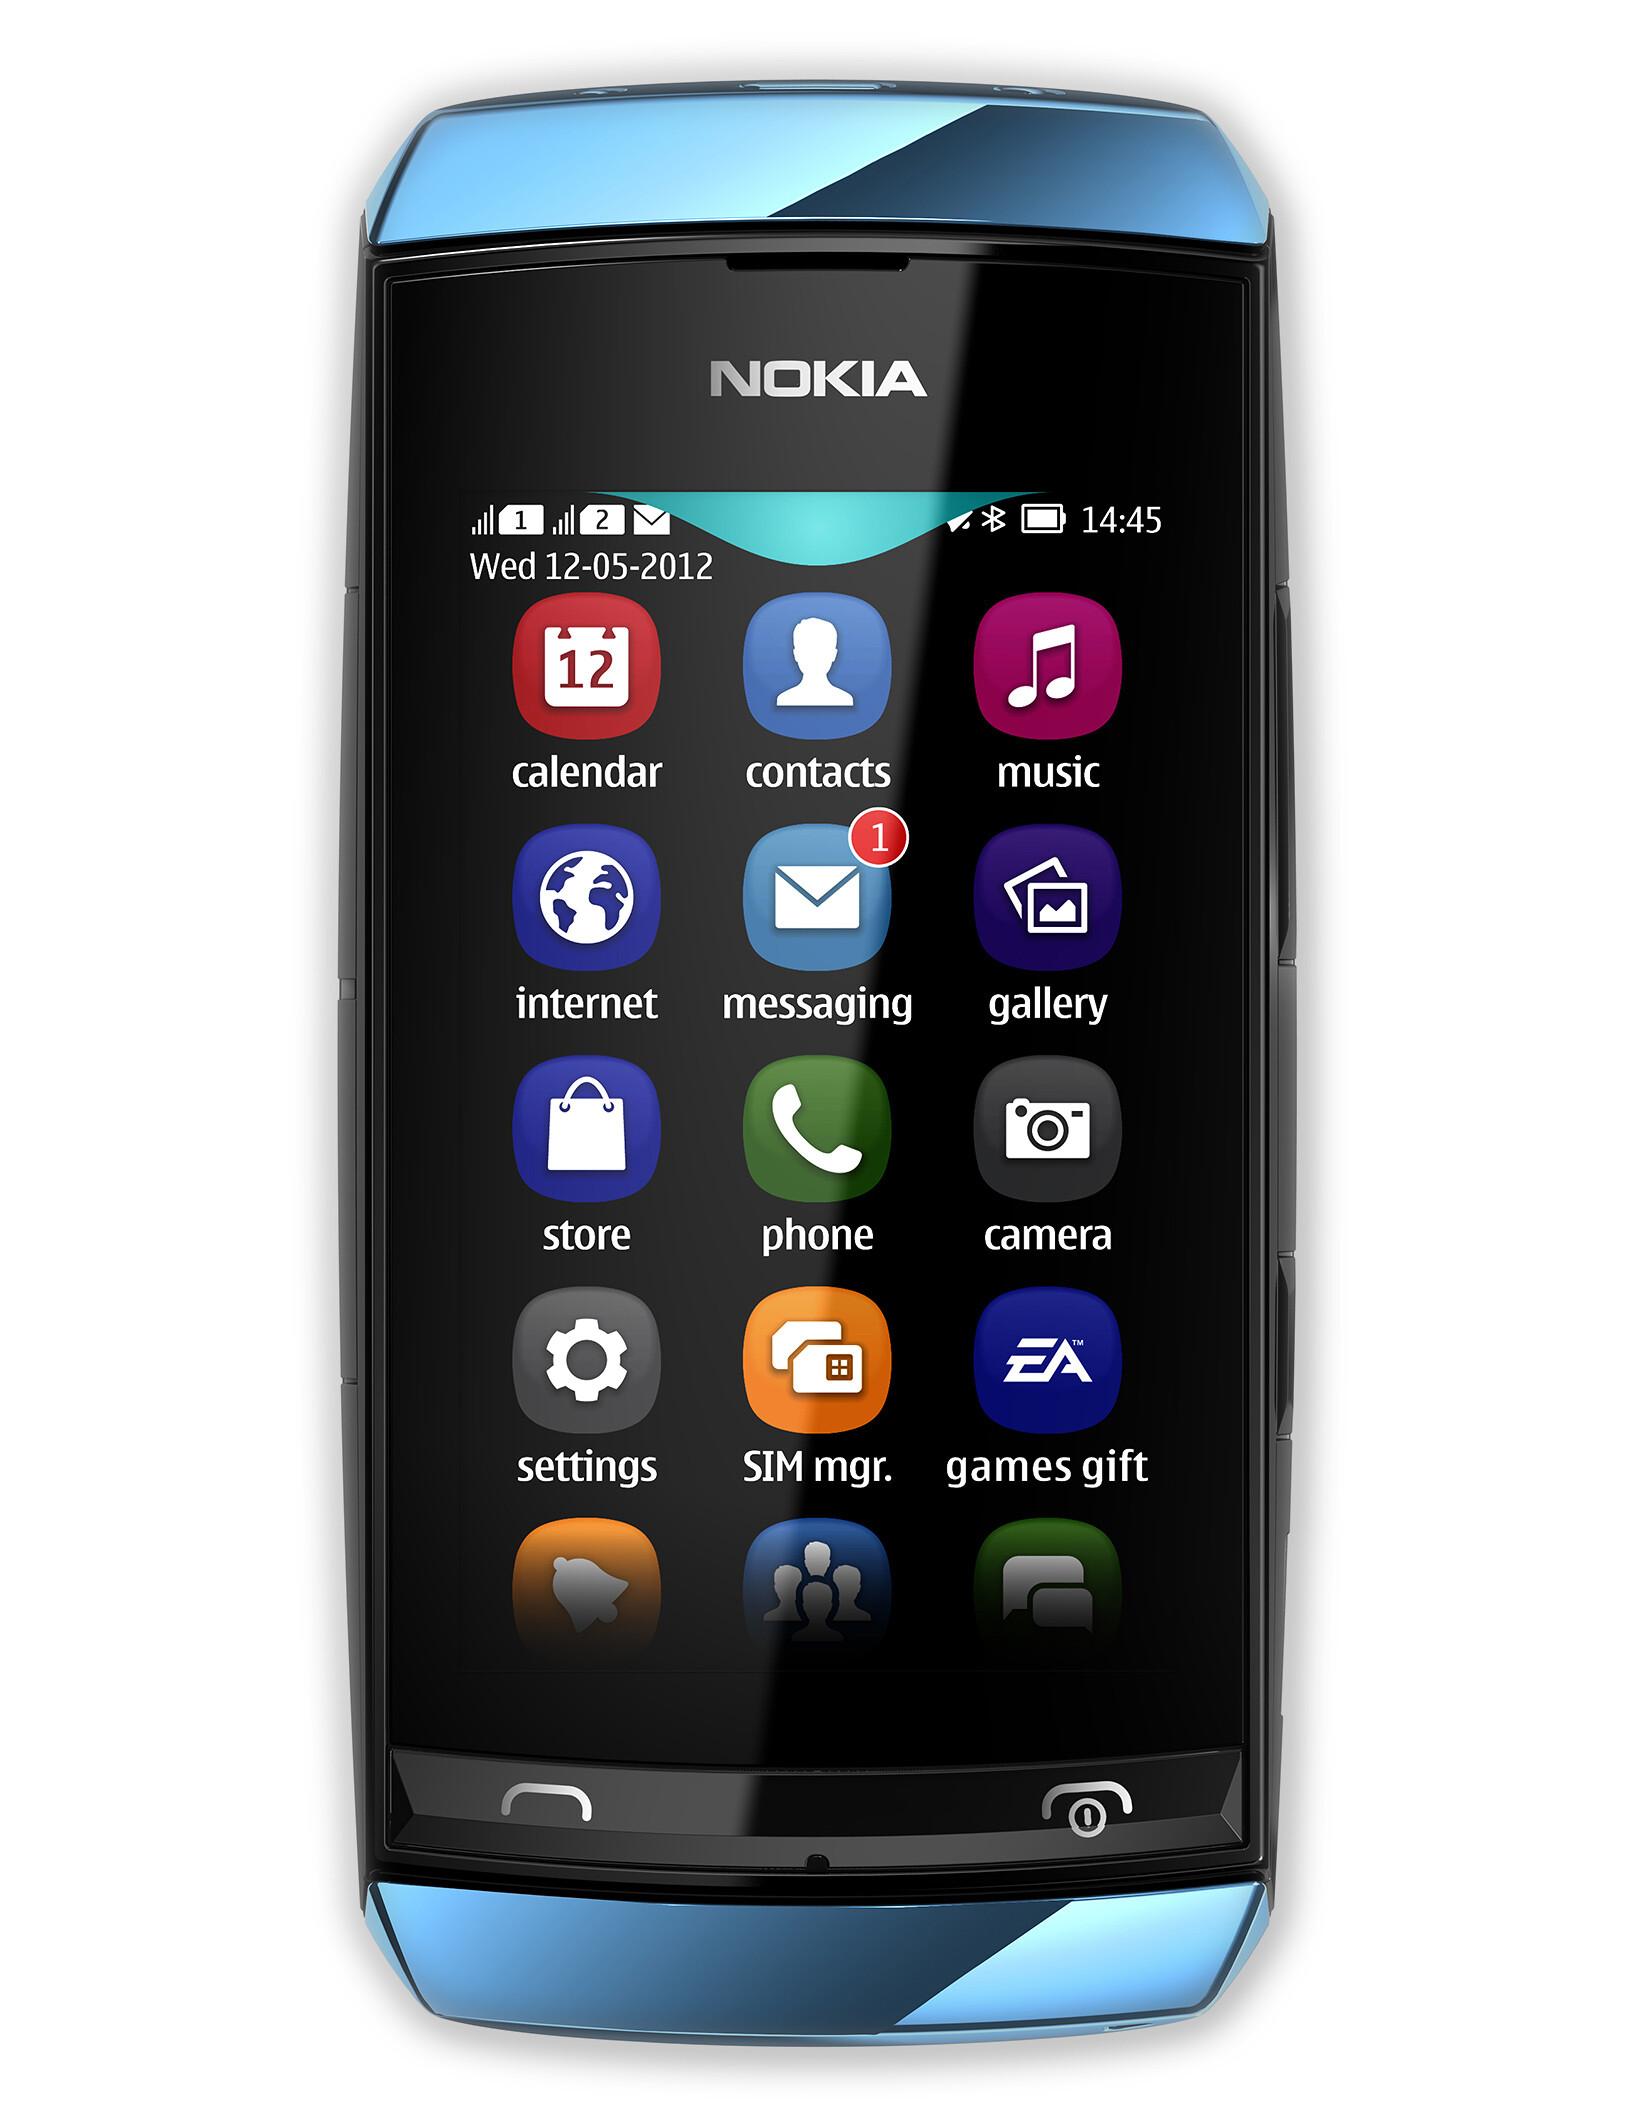 Nokia Asha 305 Front Viewjpg | Apps Directories